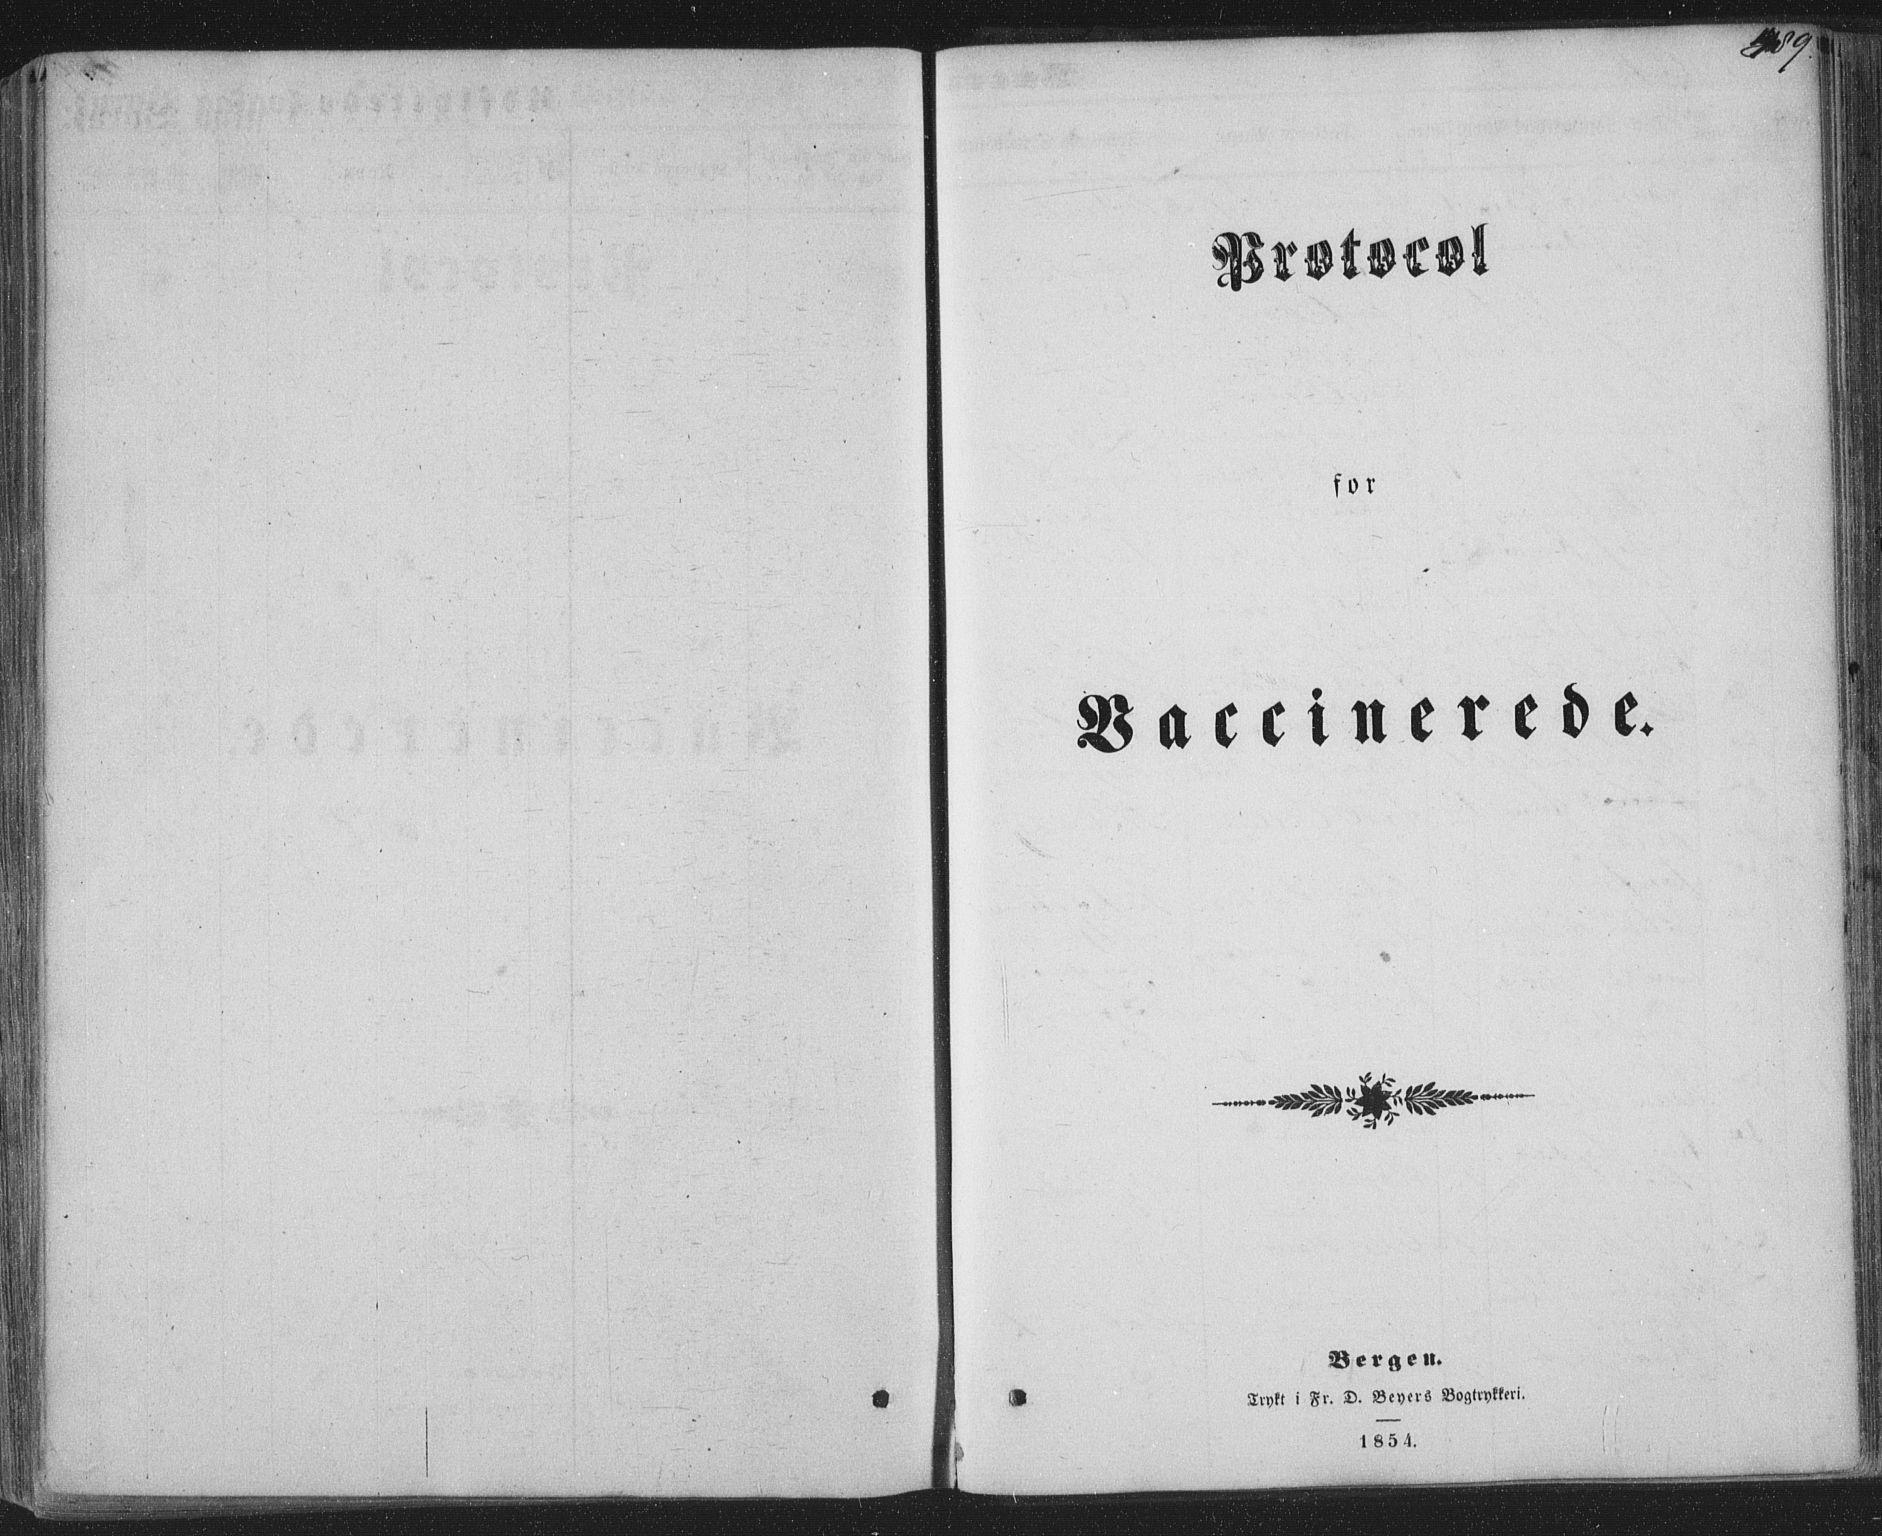 SAT, Ministerialprotokoller, klokkerbøker og fødselsregistre - Nordland, 863/L0896: Ministerialbok nr. 863A08, 1861-1871, s. 489